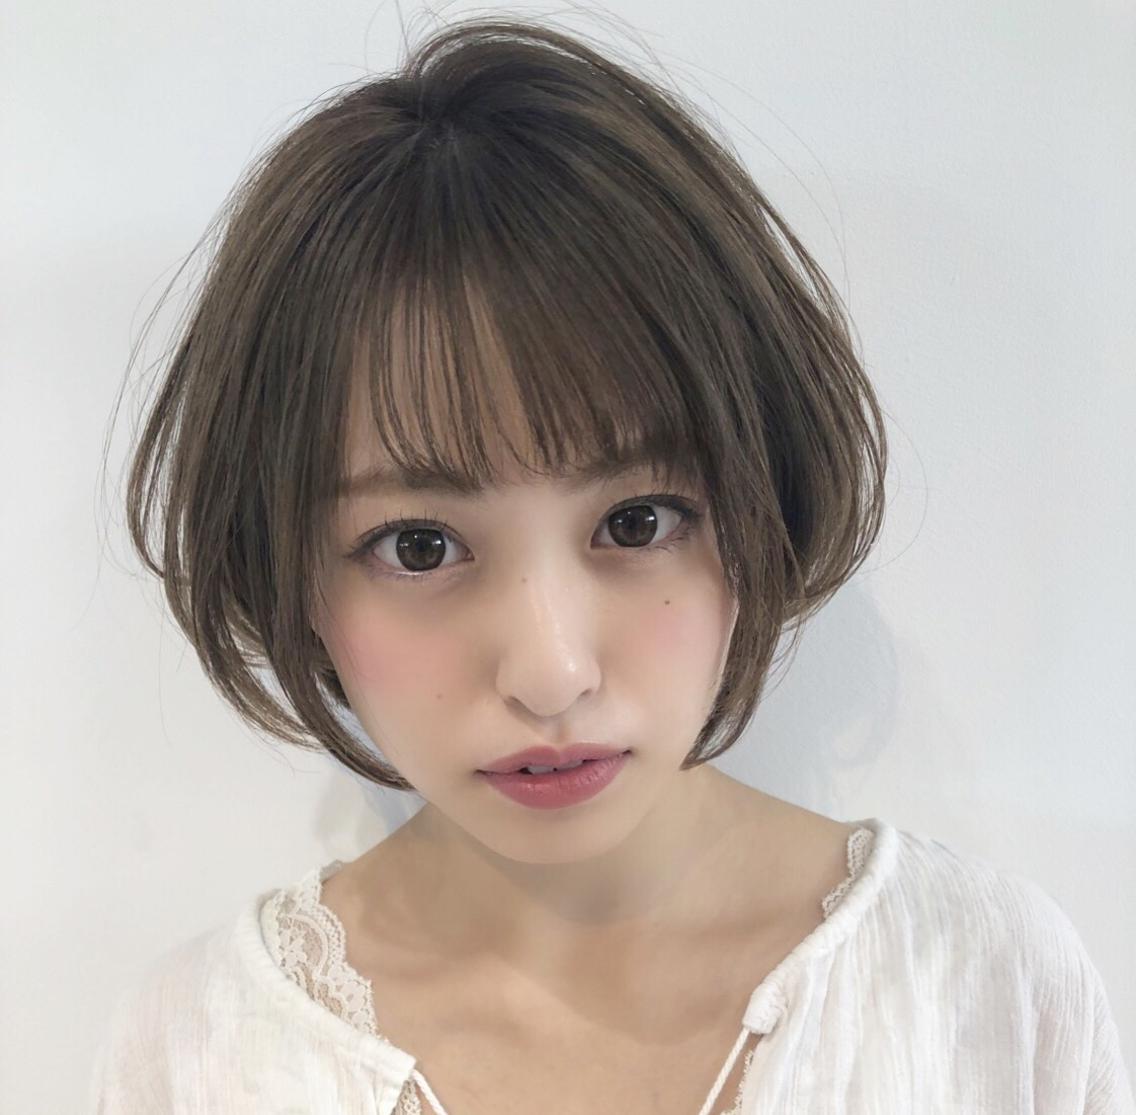 ⭐️18時以降限定⭐️無料カットモデル募集❗️❗️❗️横浜駅近徒歩5分❗️